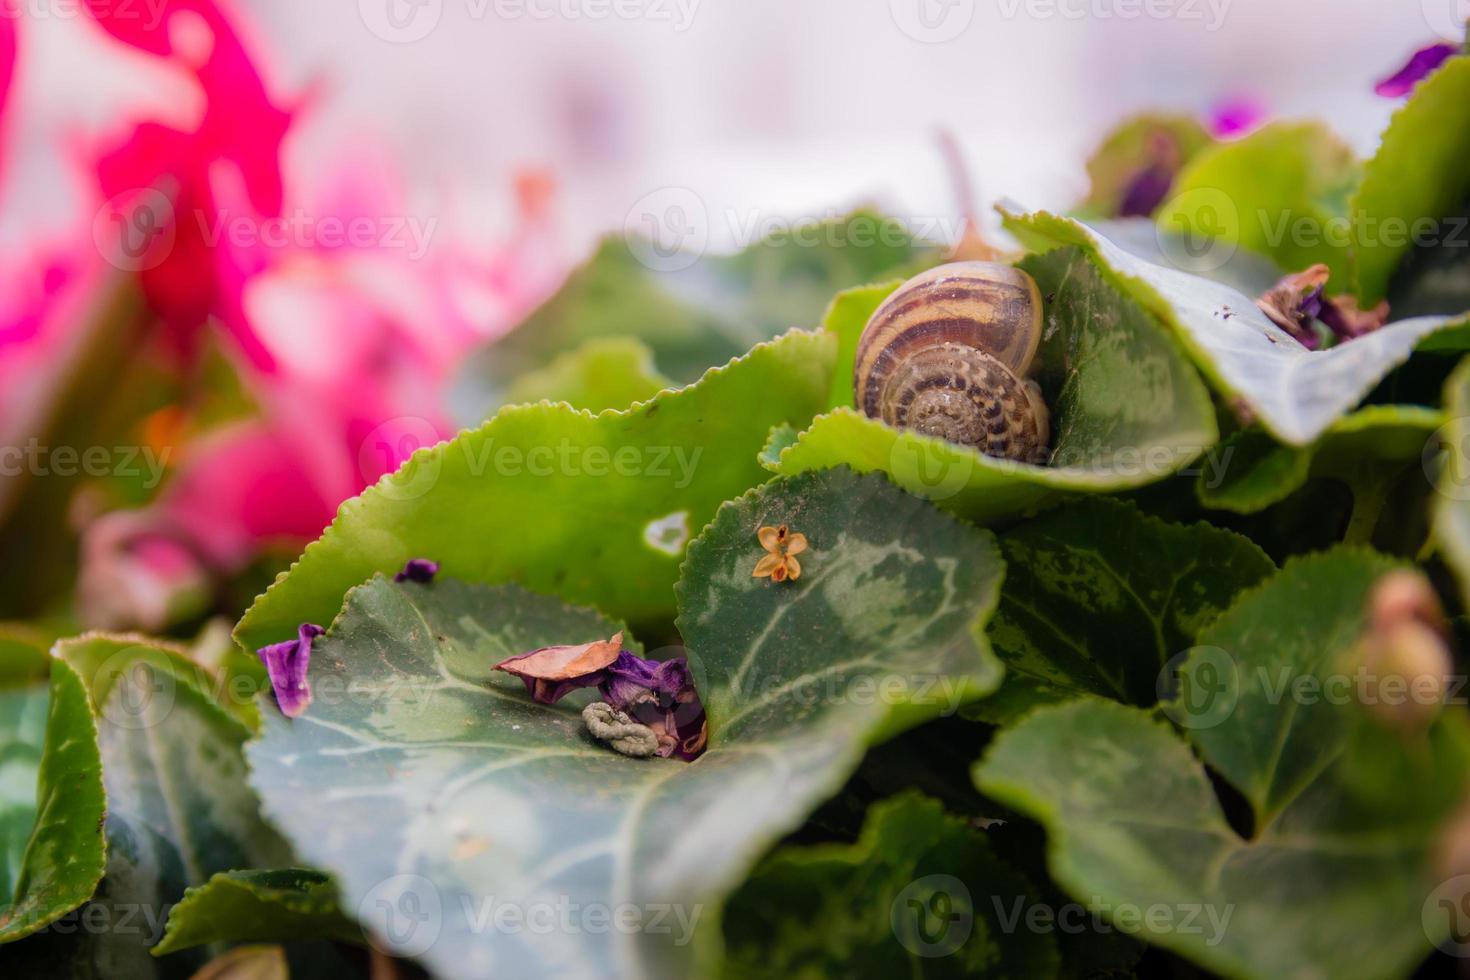 lege slakkenhuis op een cyclamenblad in de tuin foto